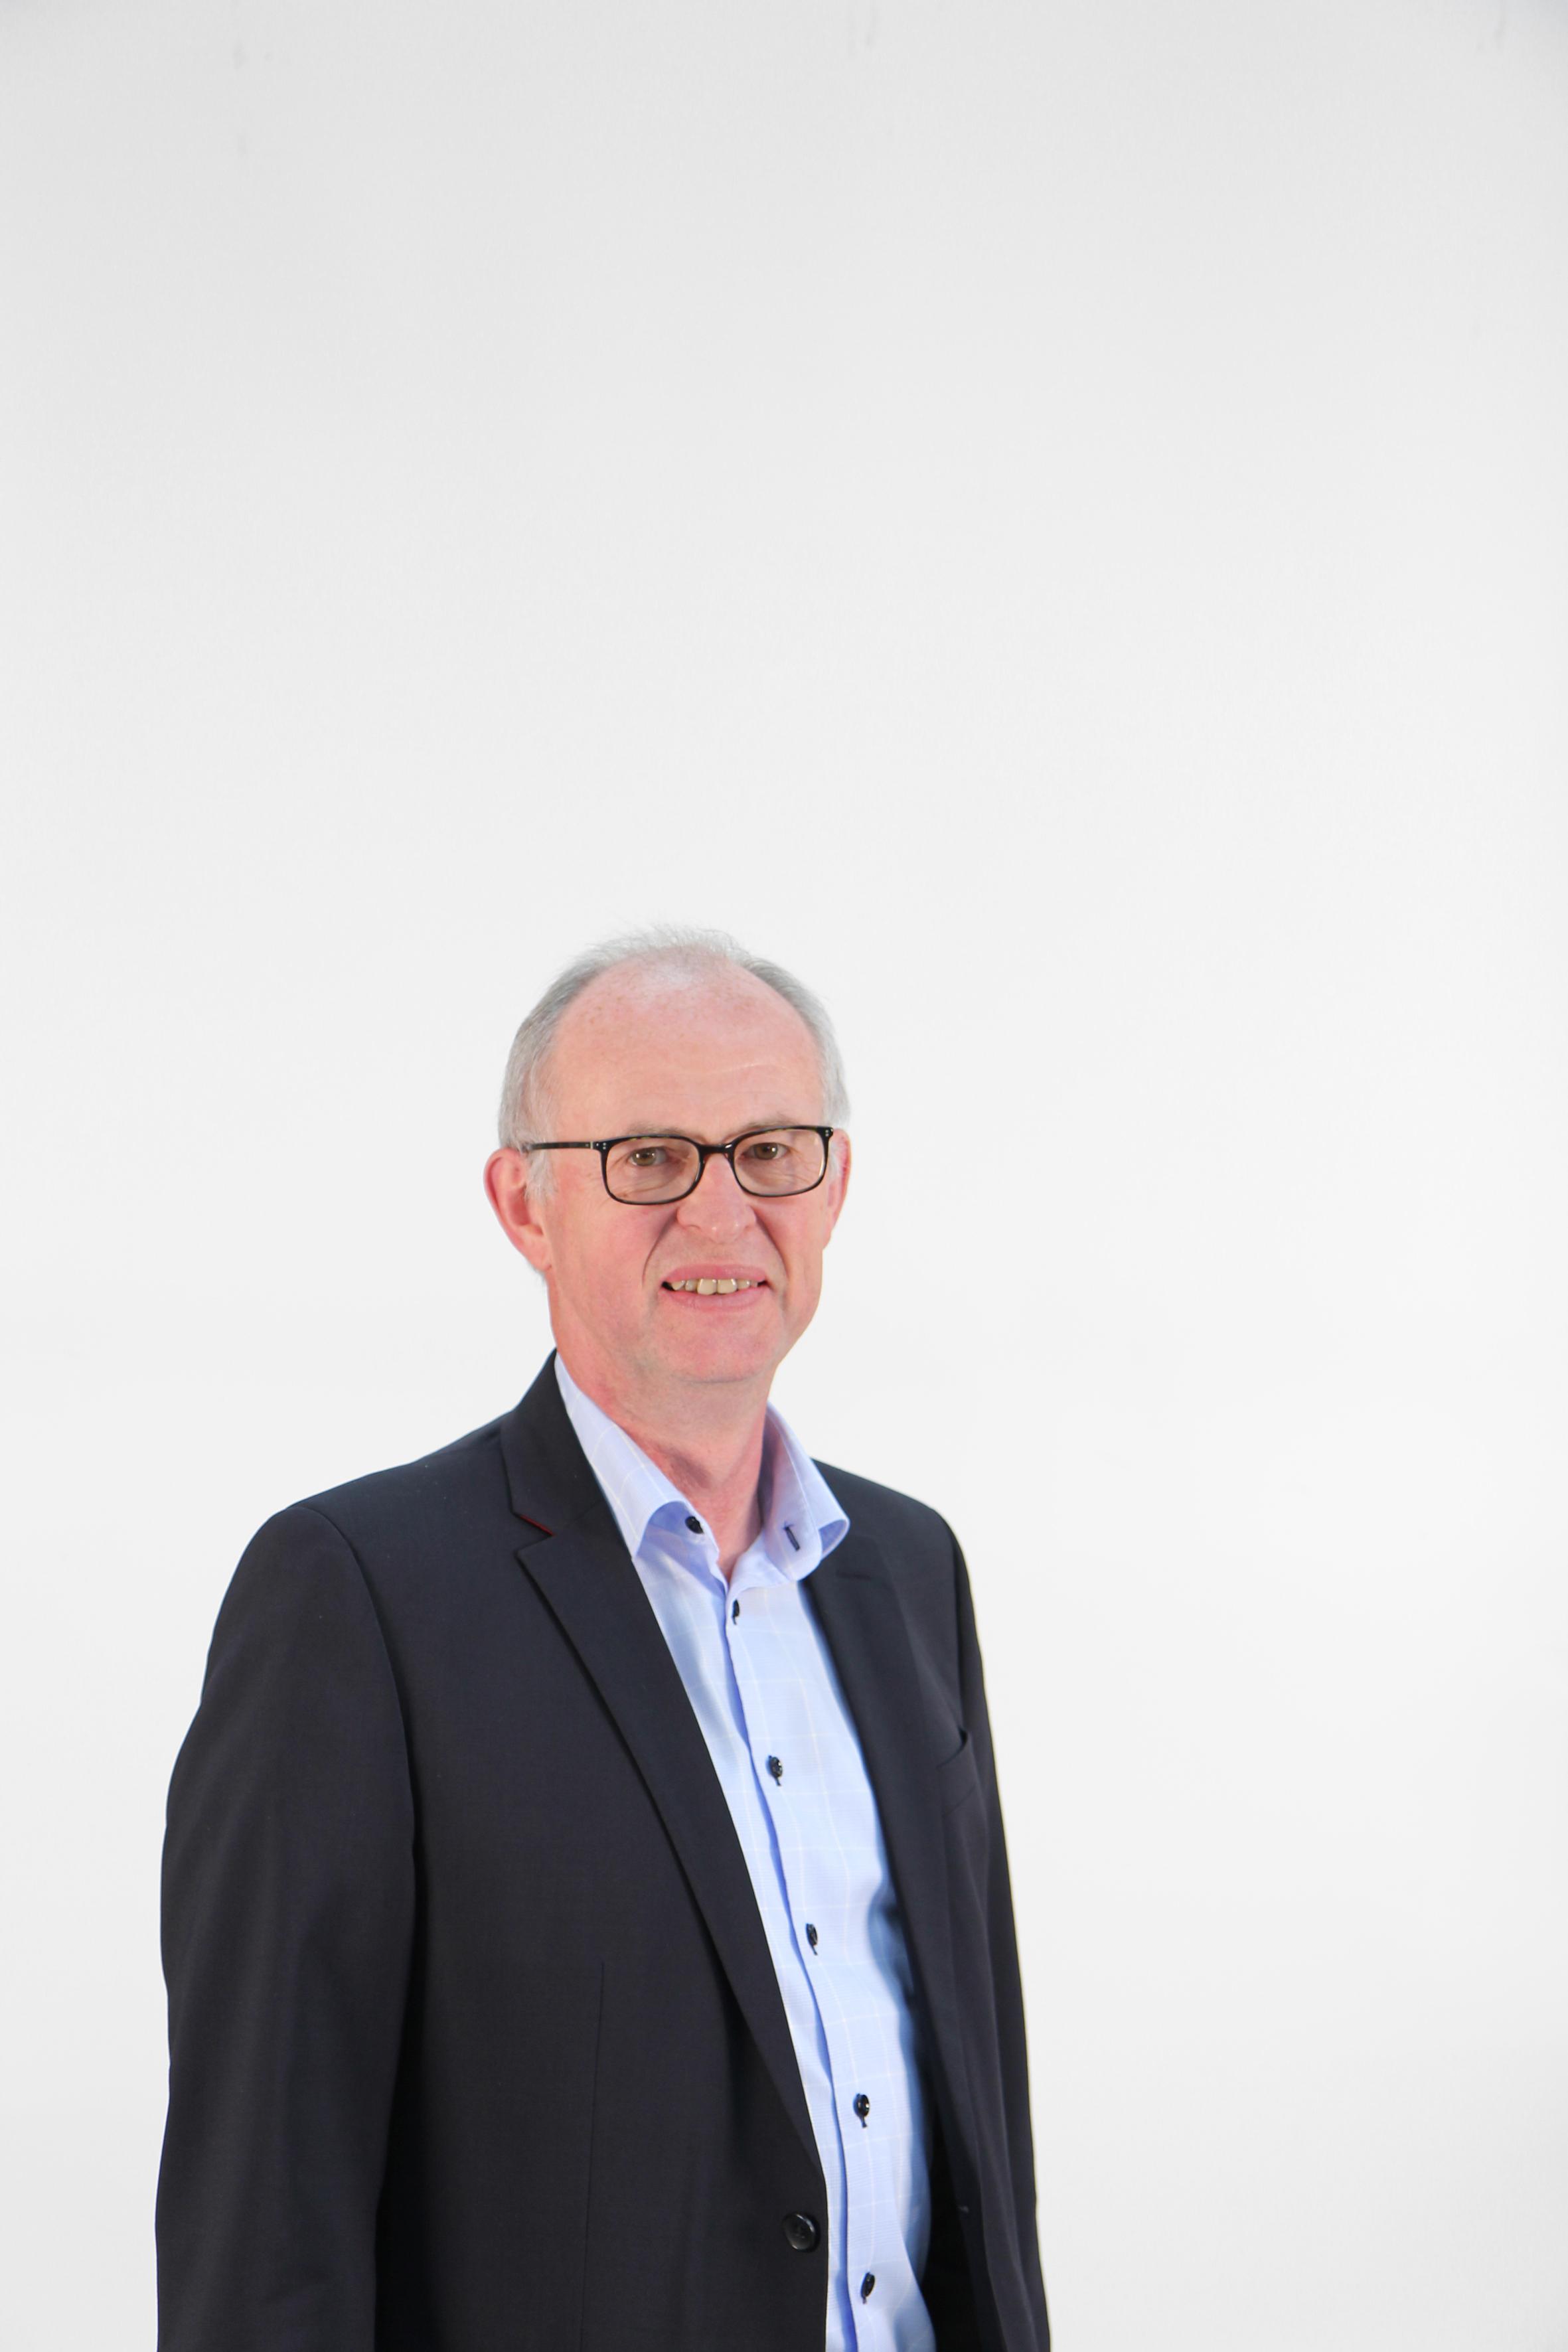 Martin Mies